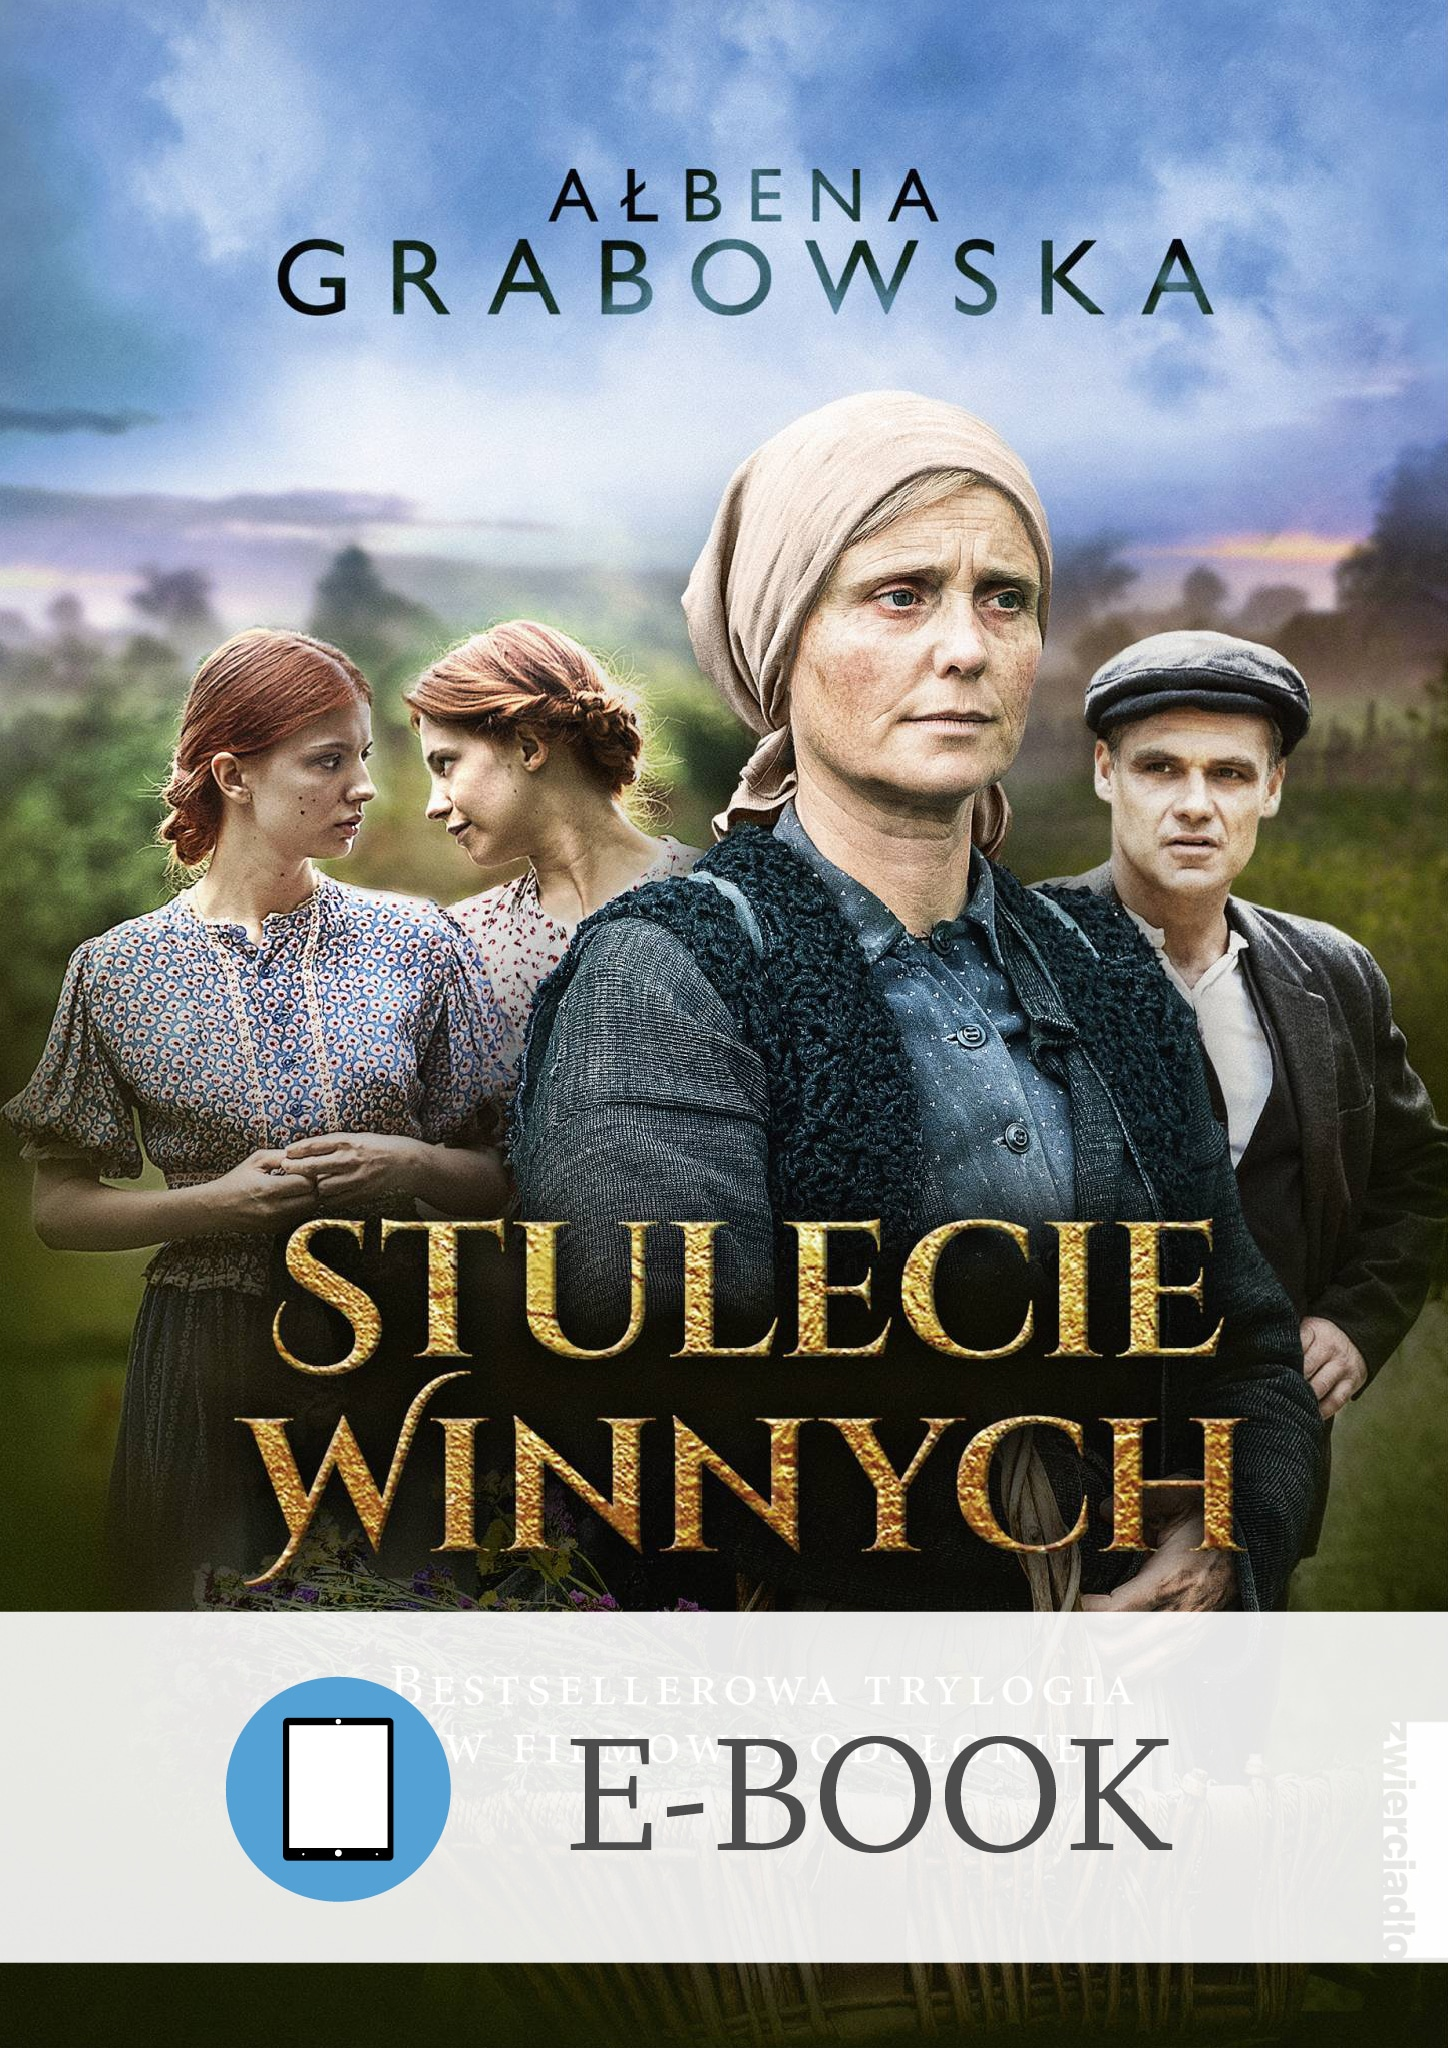 Stulecie Winnych [e-book]